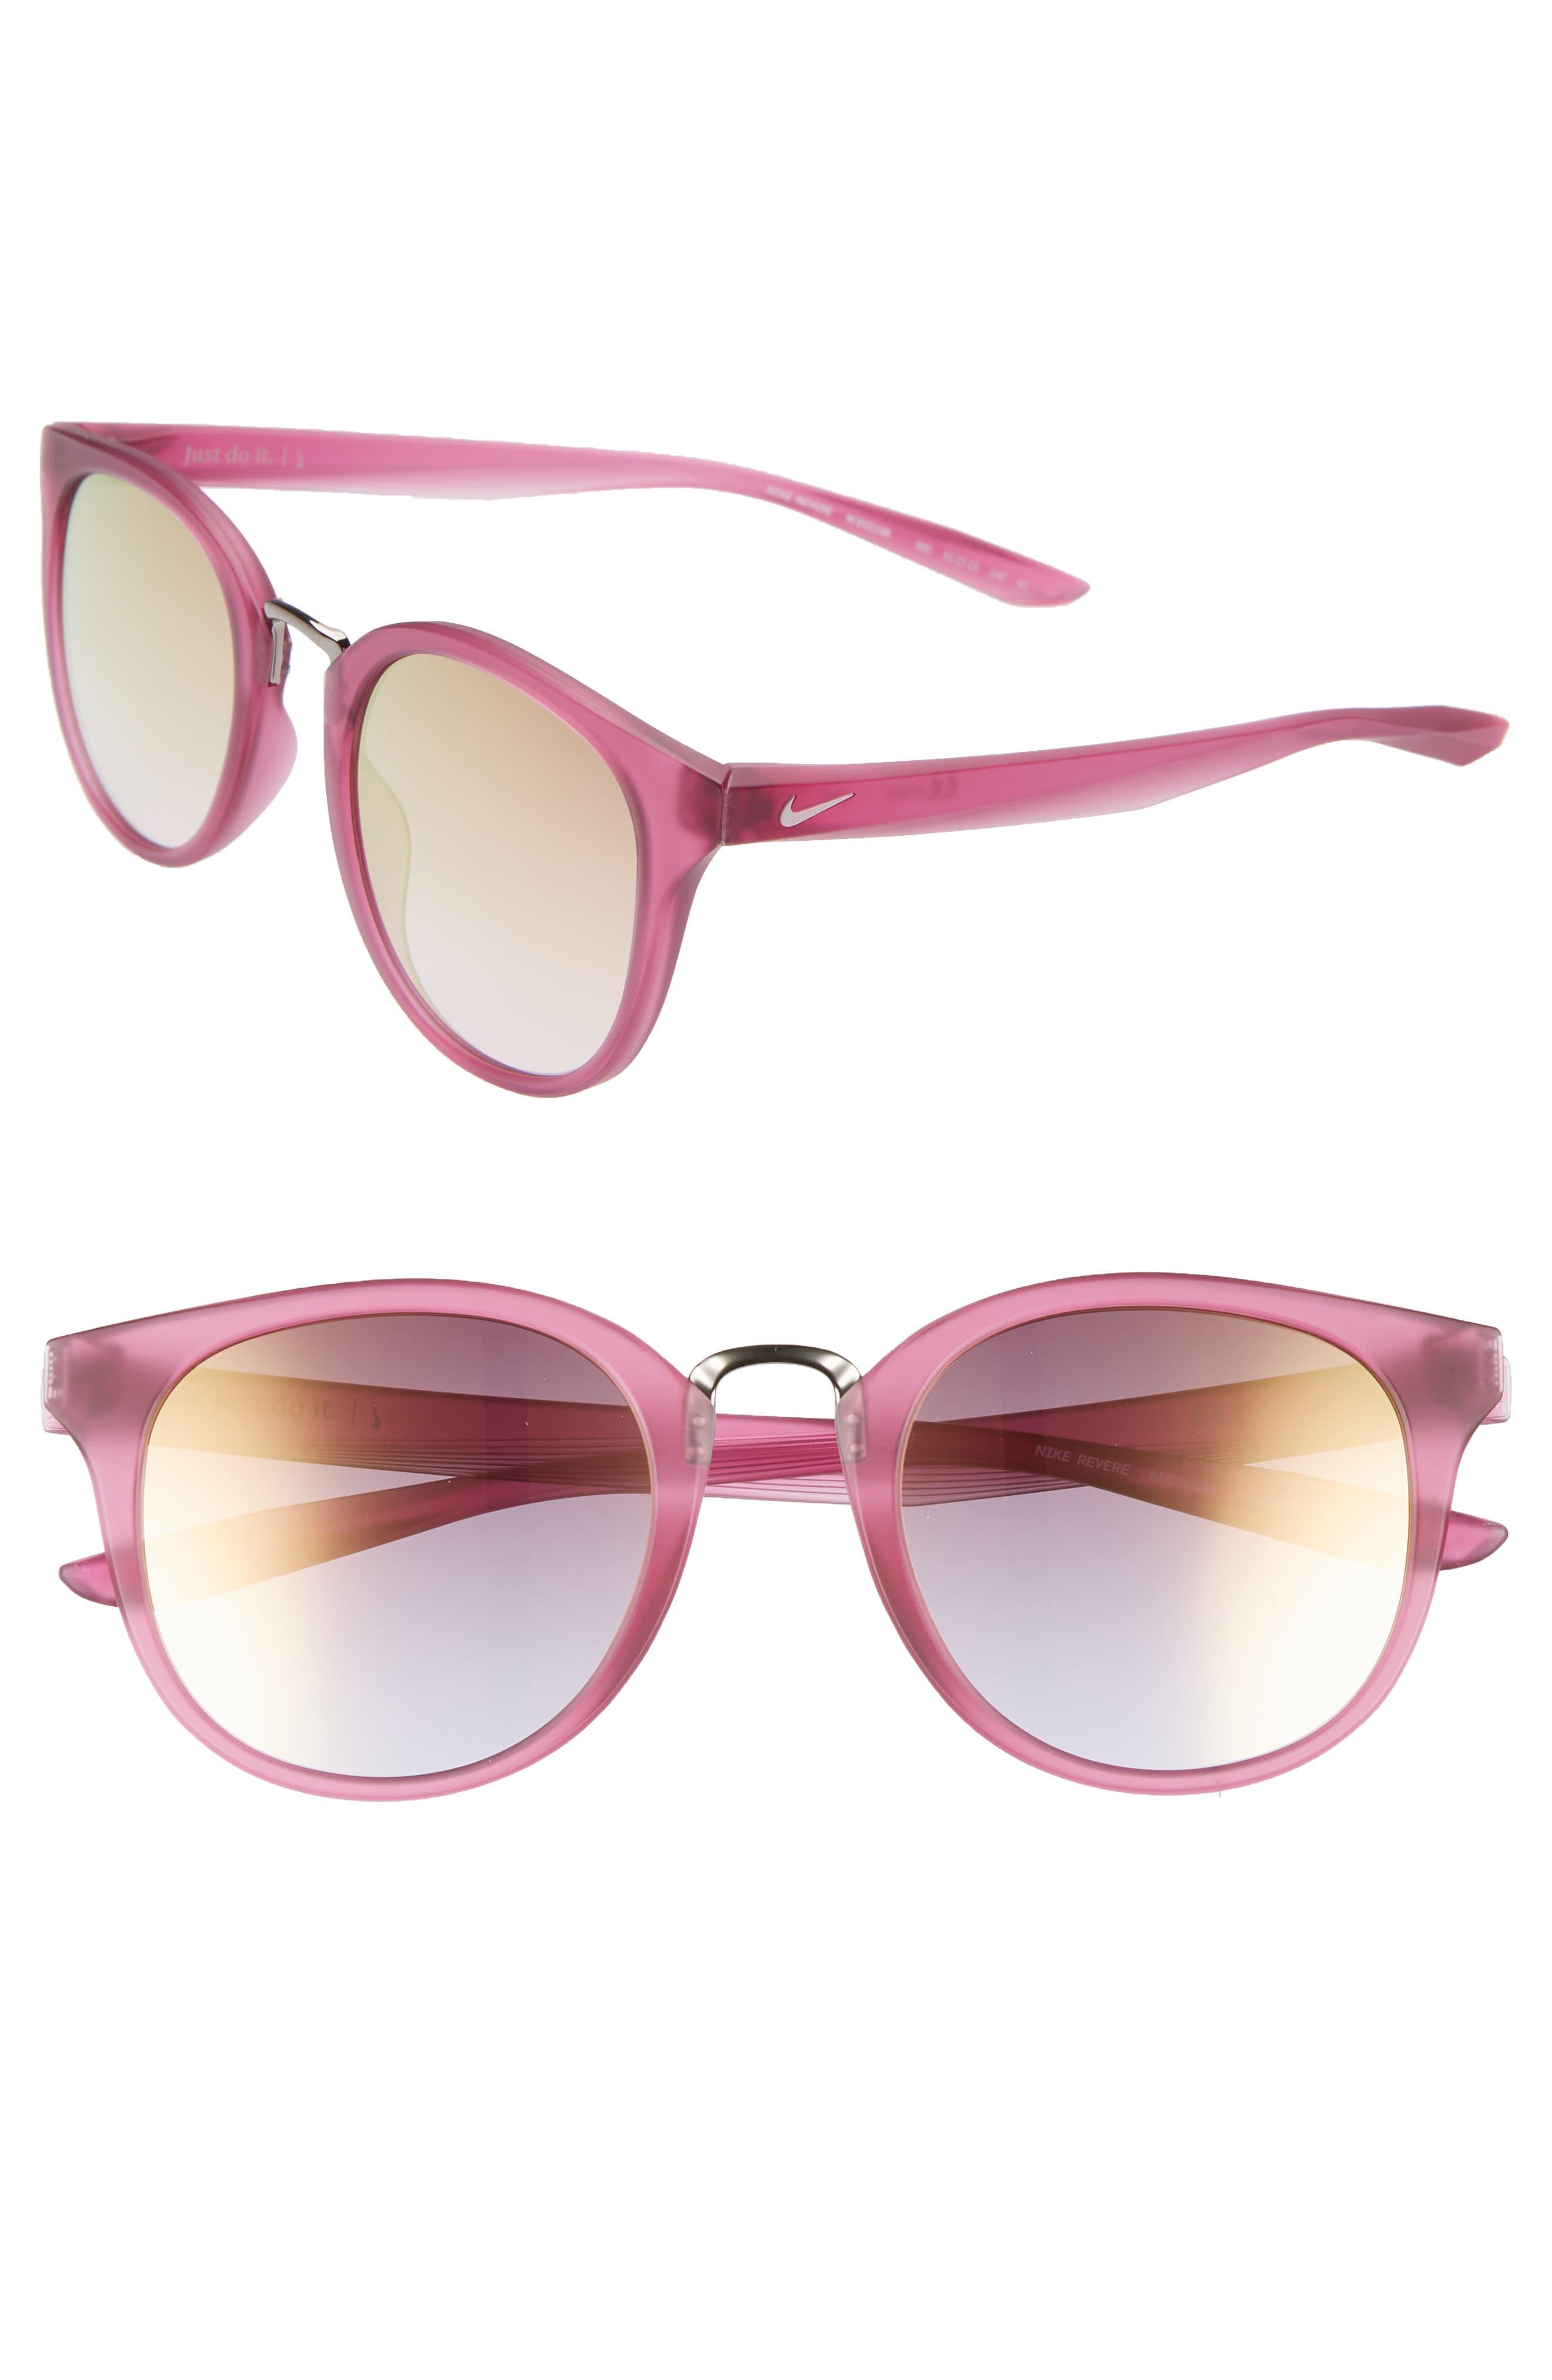 Nike Revere 51Mm Mirrored Round Sunglasses - True Berry/ Rose Pink